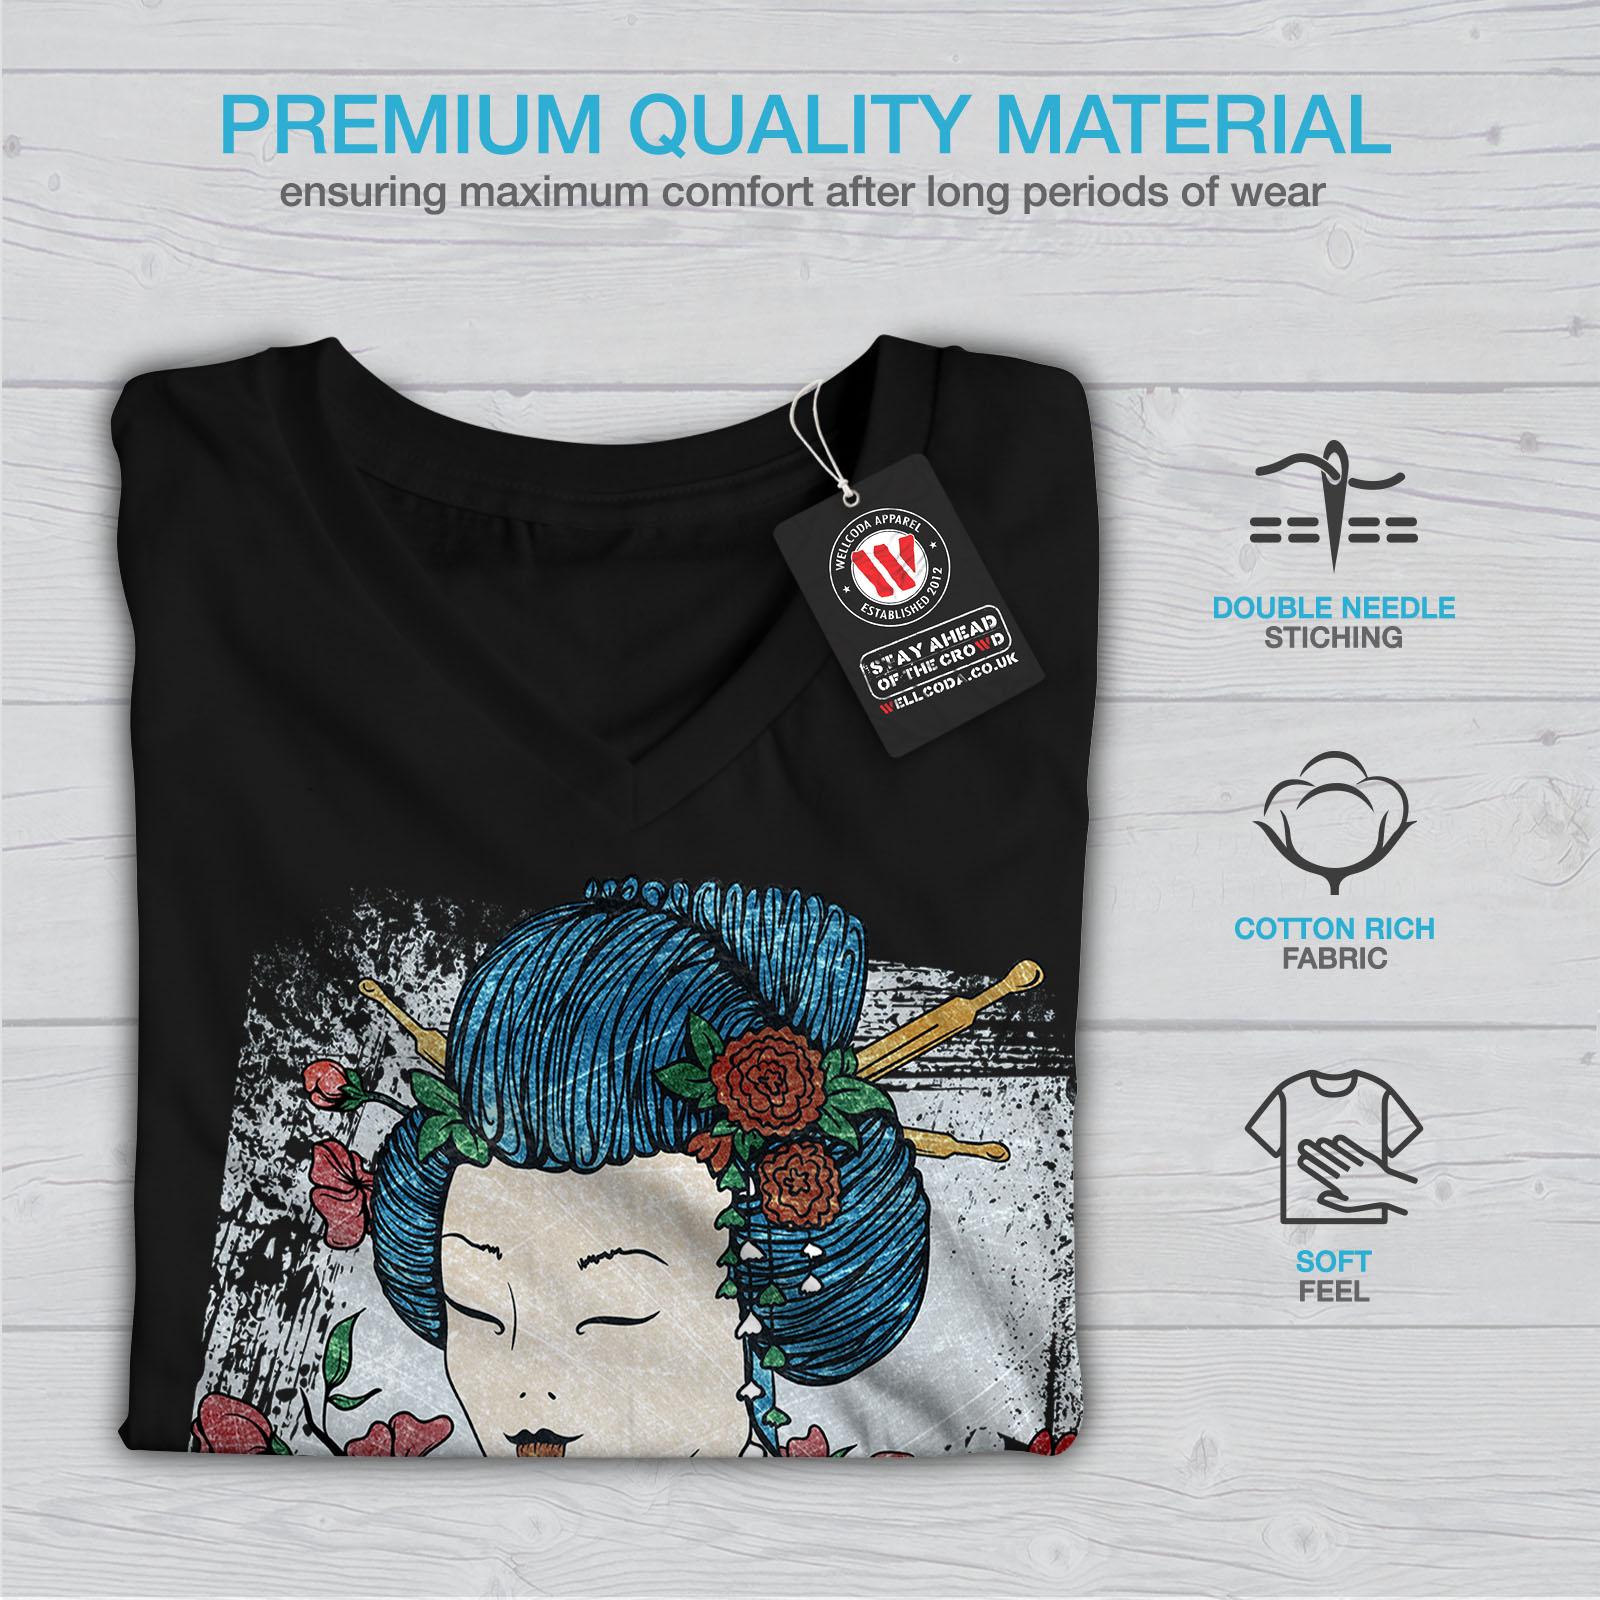 Wellcoda-Japan-Woman-Beauty-Womens-V-Neck-T-shirt-Oriental-Graphic-Design-Tee thumbnail 5